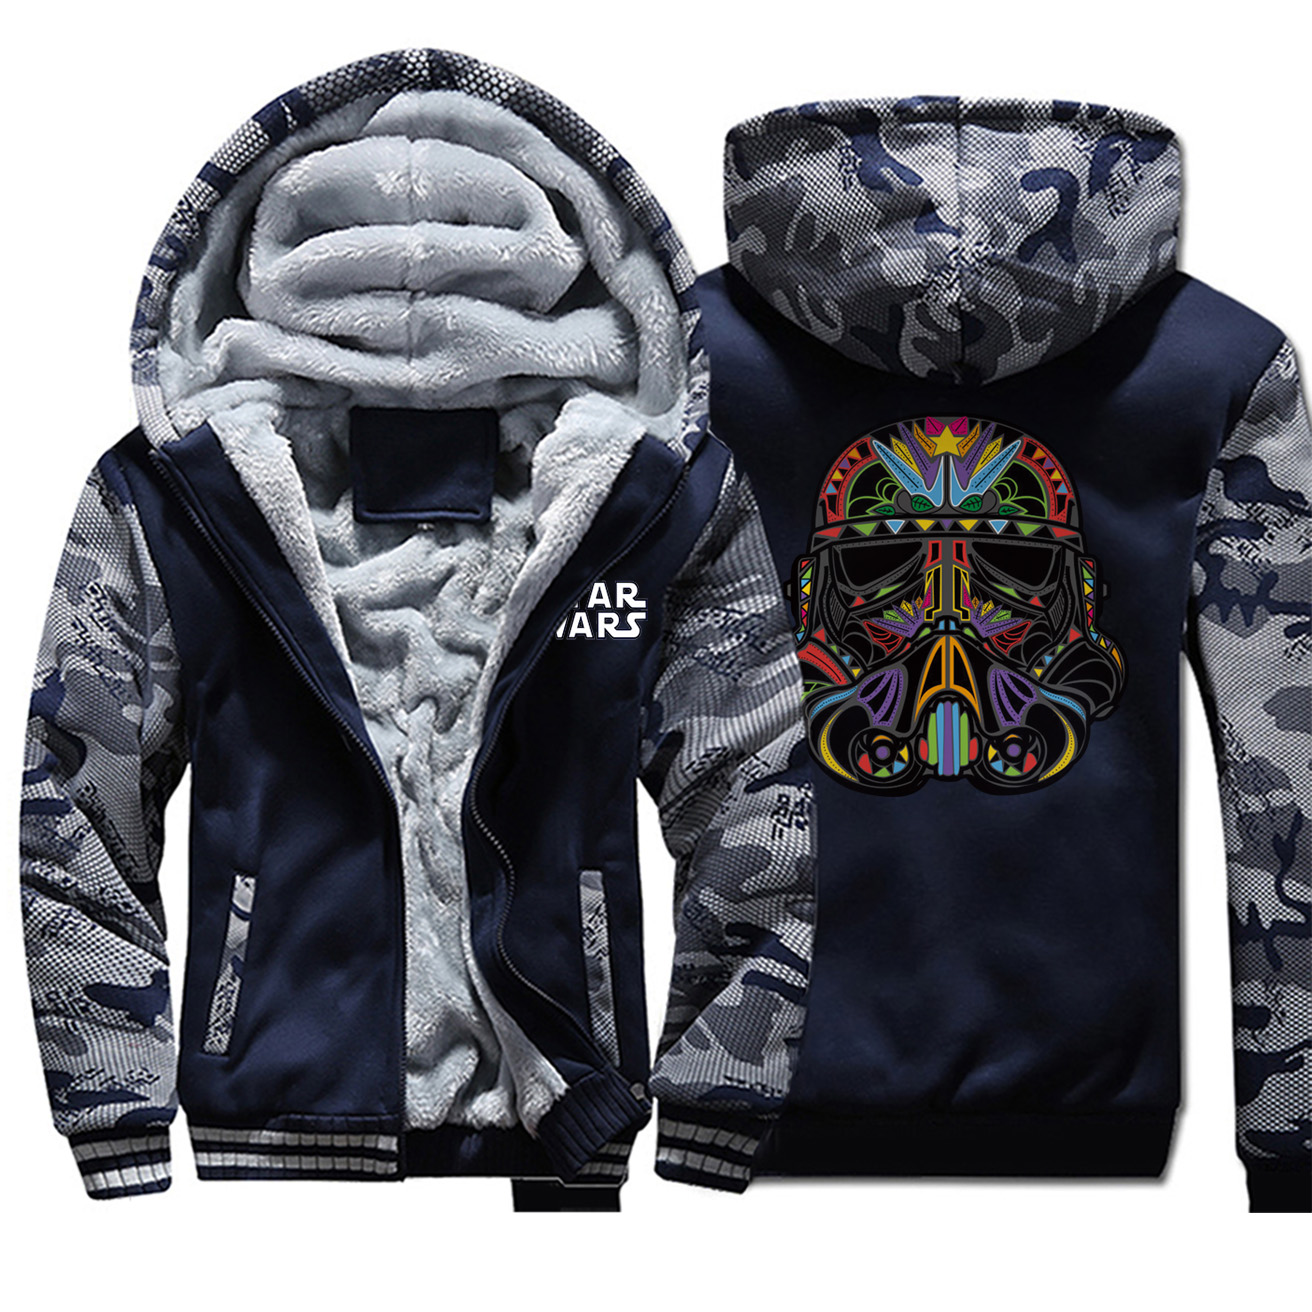 Star Wars Jackets Men Darth Vader Hoodies Sweatshirt Winter Thick Feece Zipper Coats Sportswear Camouflage Starwars Plus Size